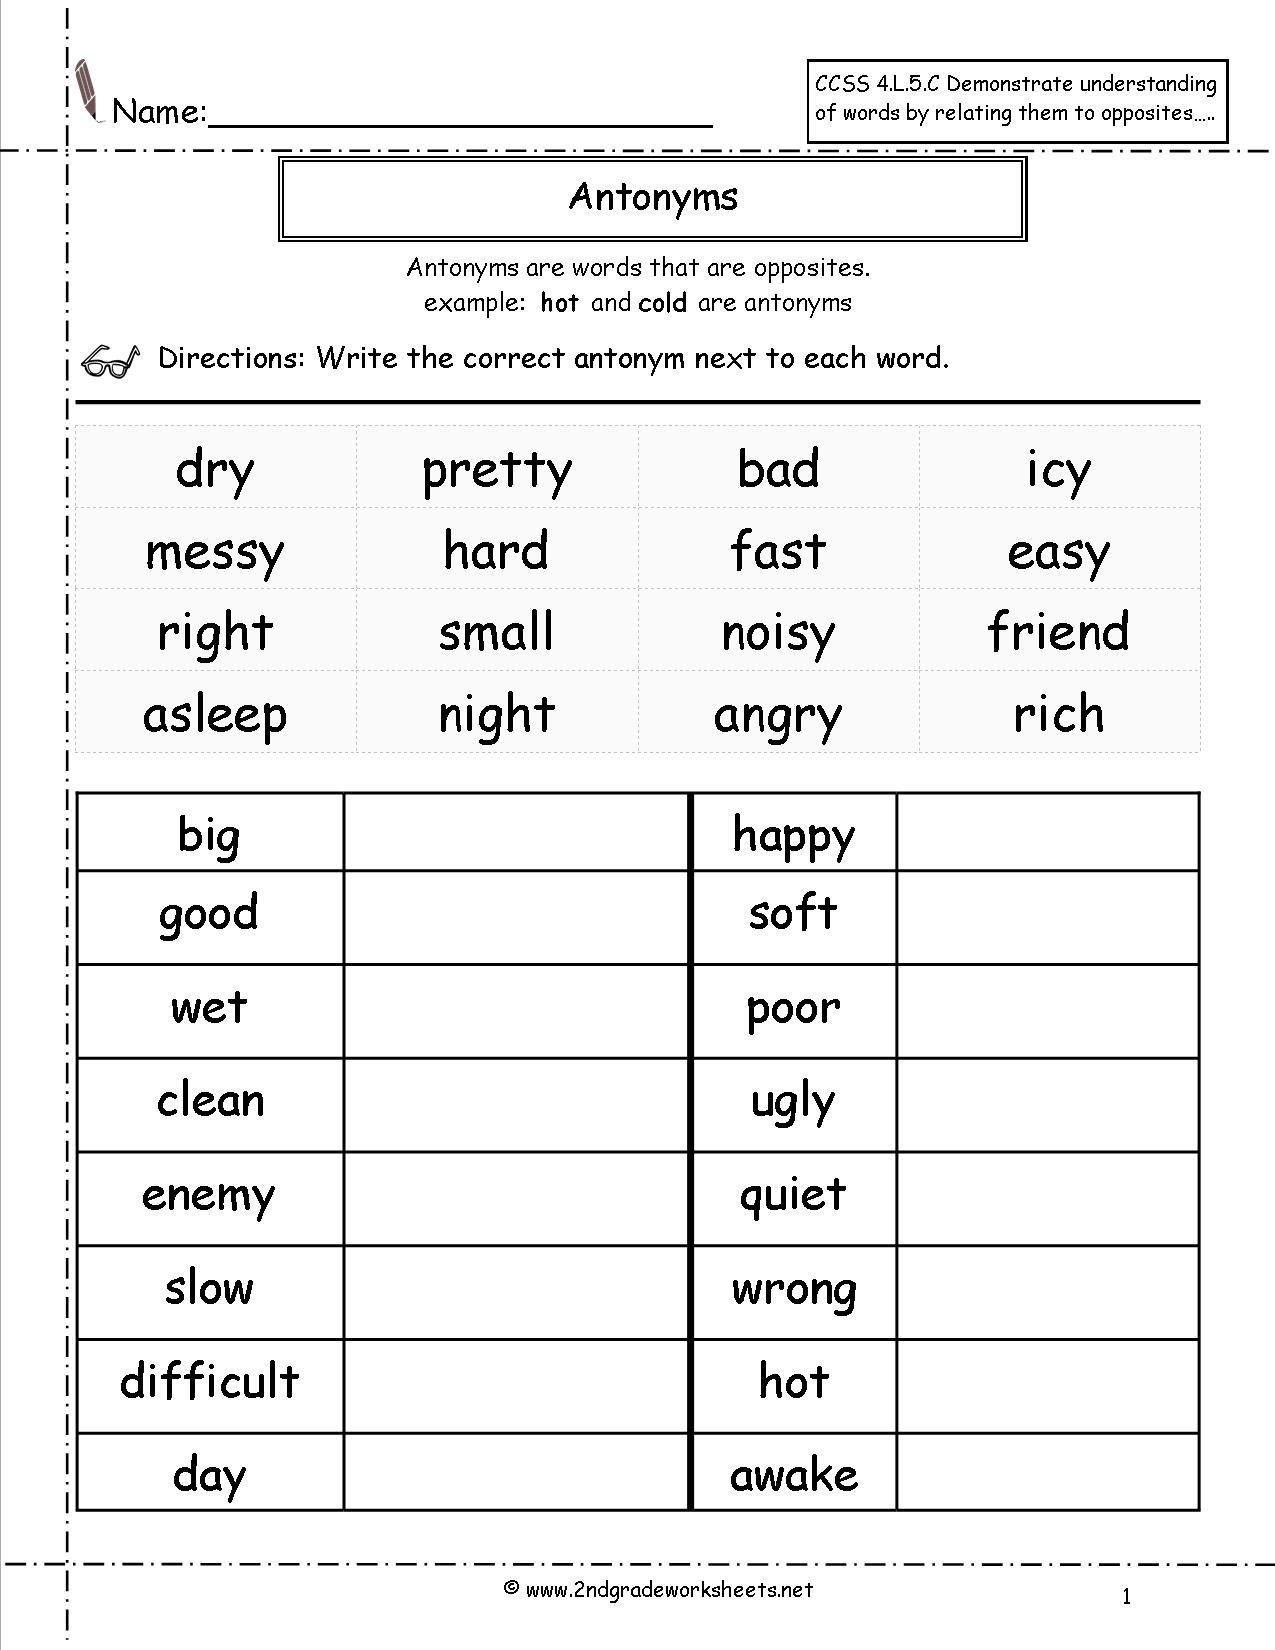 Free Language/grammar Worksheets And Printouts - Free Printable Grammar Worksheets For 2Nd Grade